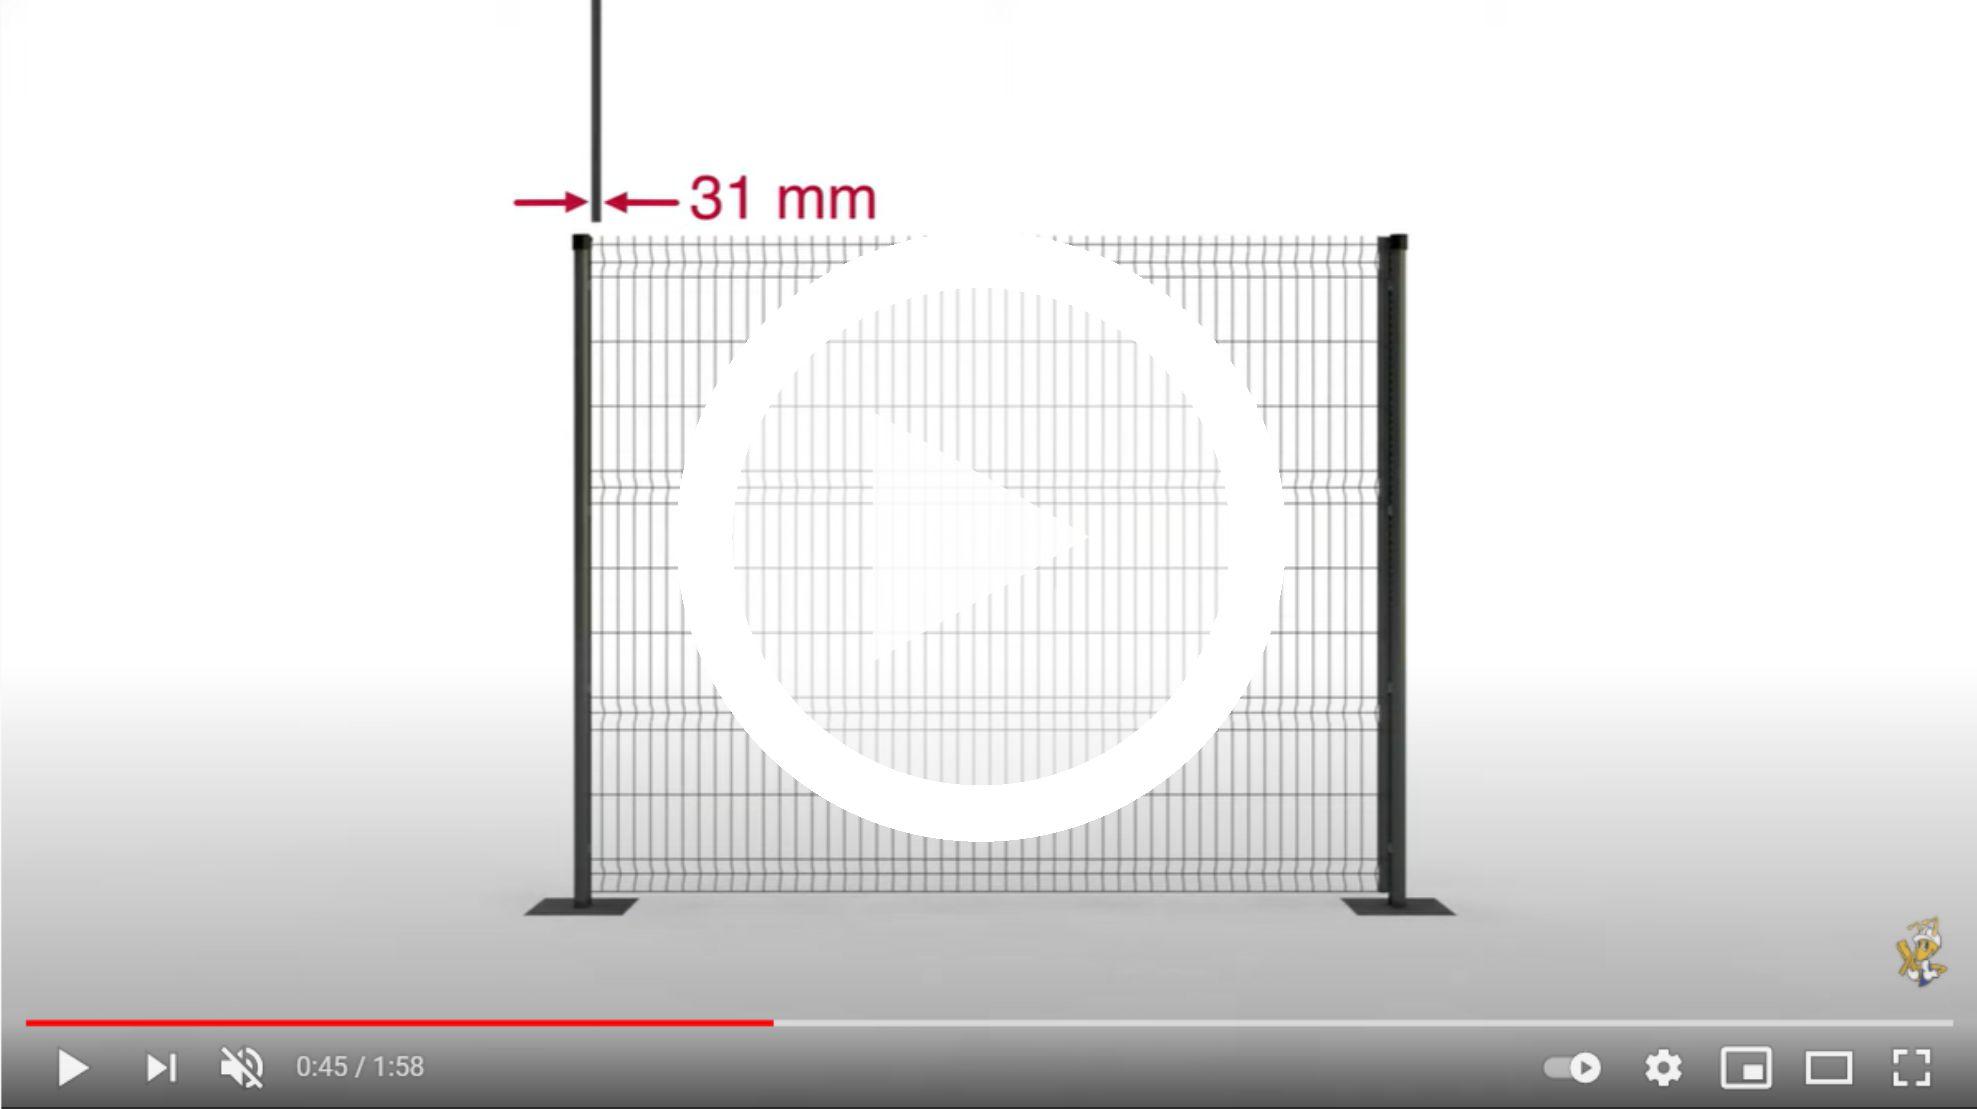 montaz-przeslon-nylofor-screeno-line-od-betafence